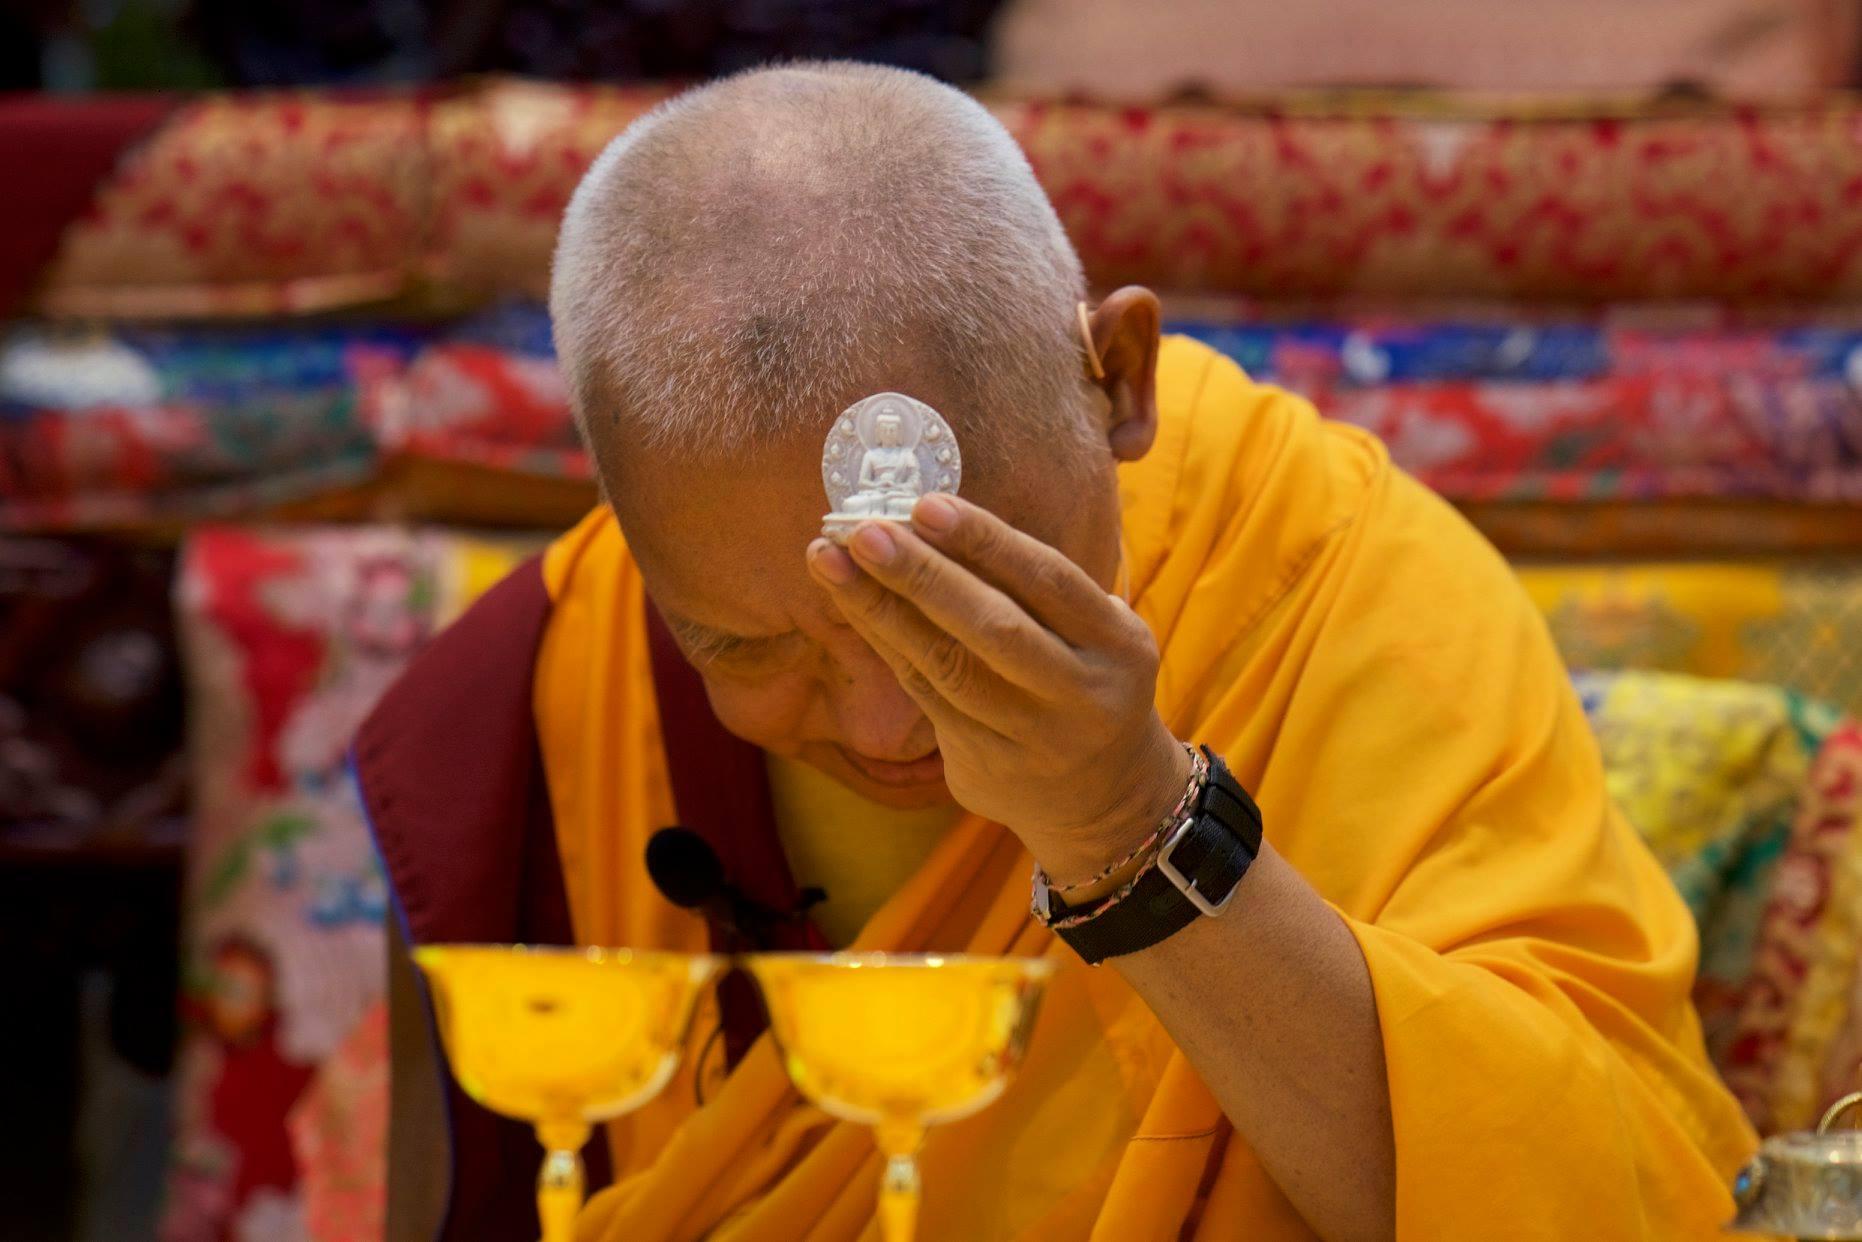 Lama Zopa Rinpoche bestowing Amitabha Pure Land blessing at Amitabha Buddhist Centre, Singapore, October 2018. (Photo Bill Kane)